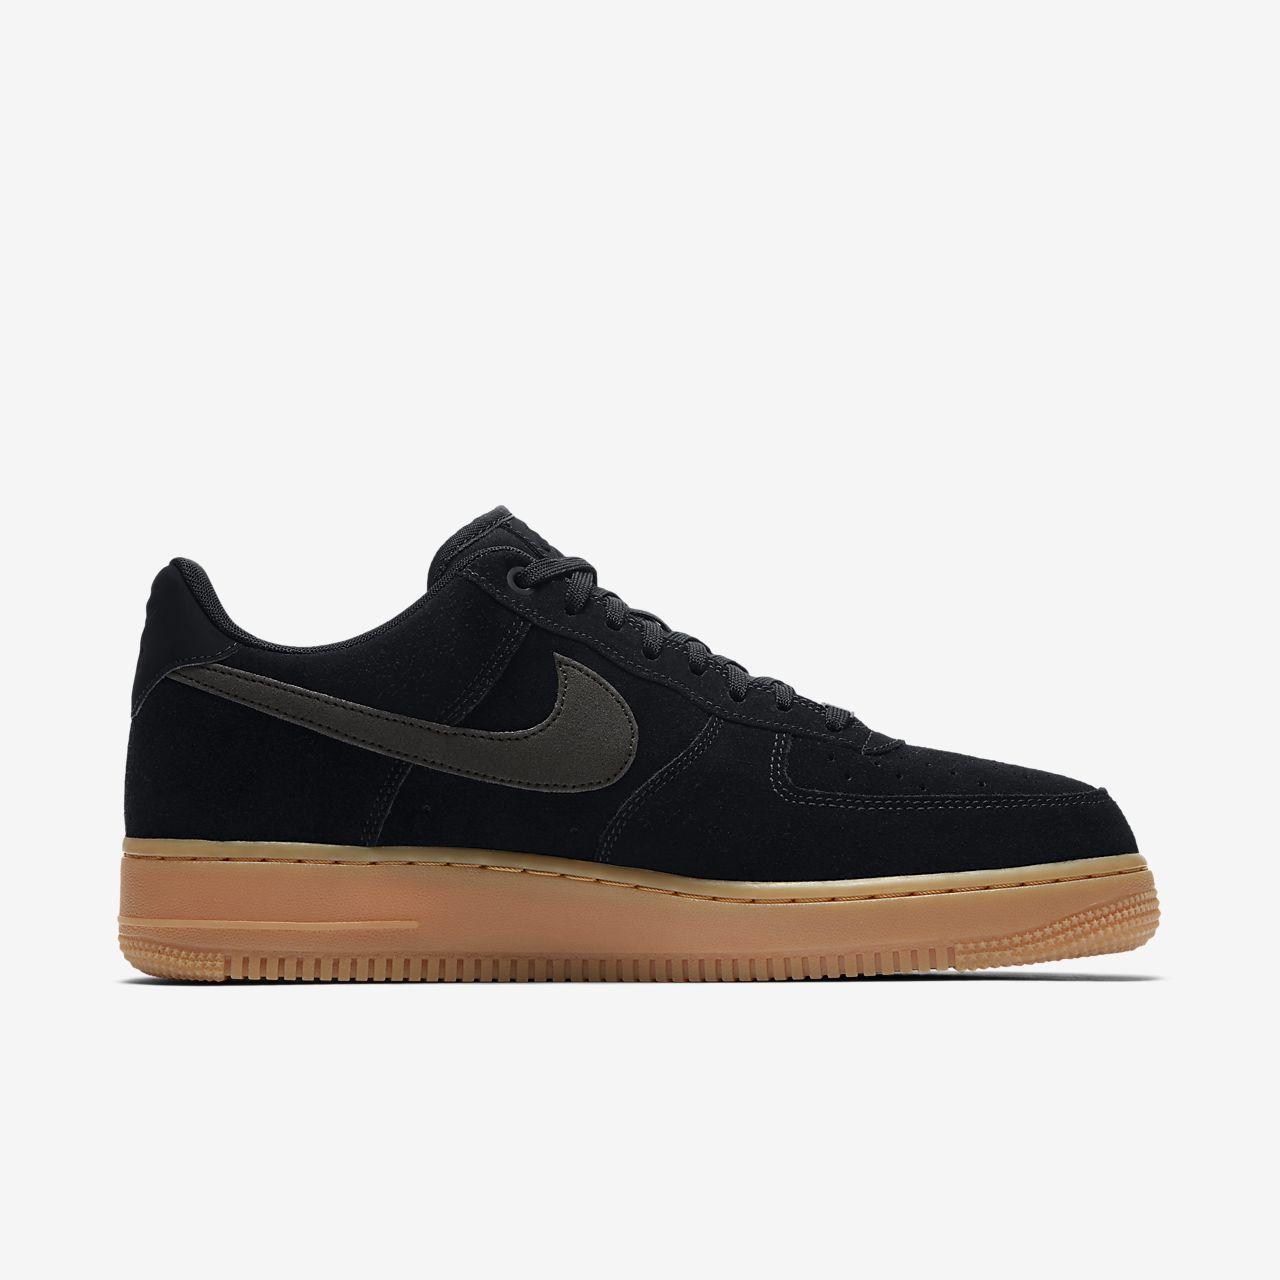 Air Force 1 07 Lv8 Suede Noire Nike Baskets HommeNike 1nbU6Zf1nL